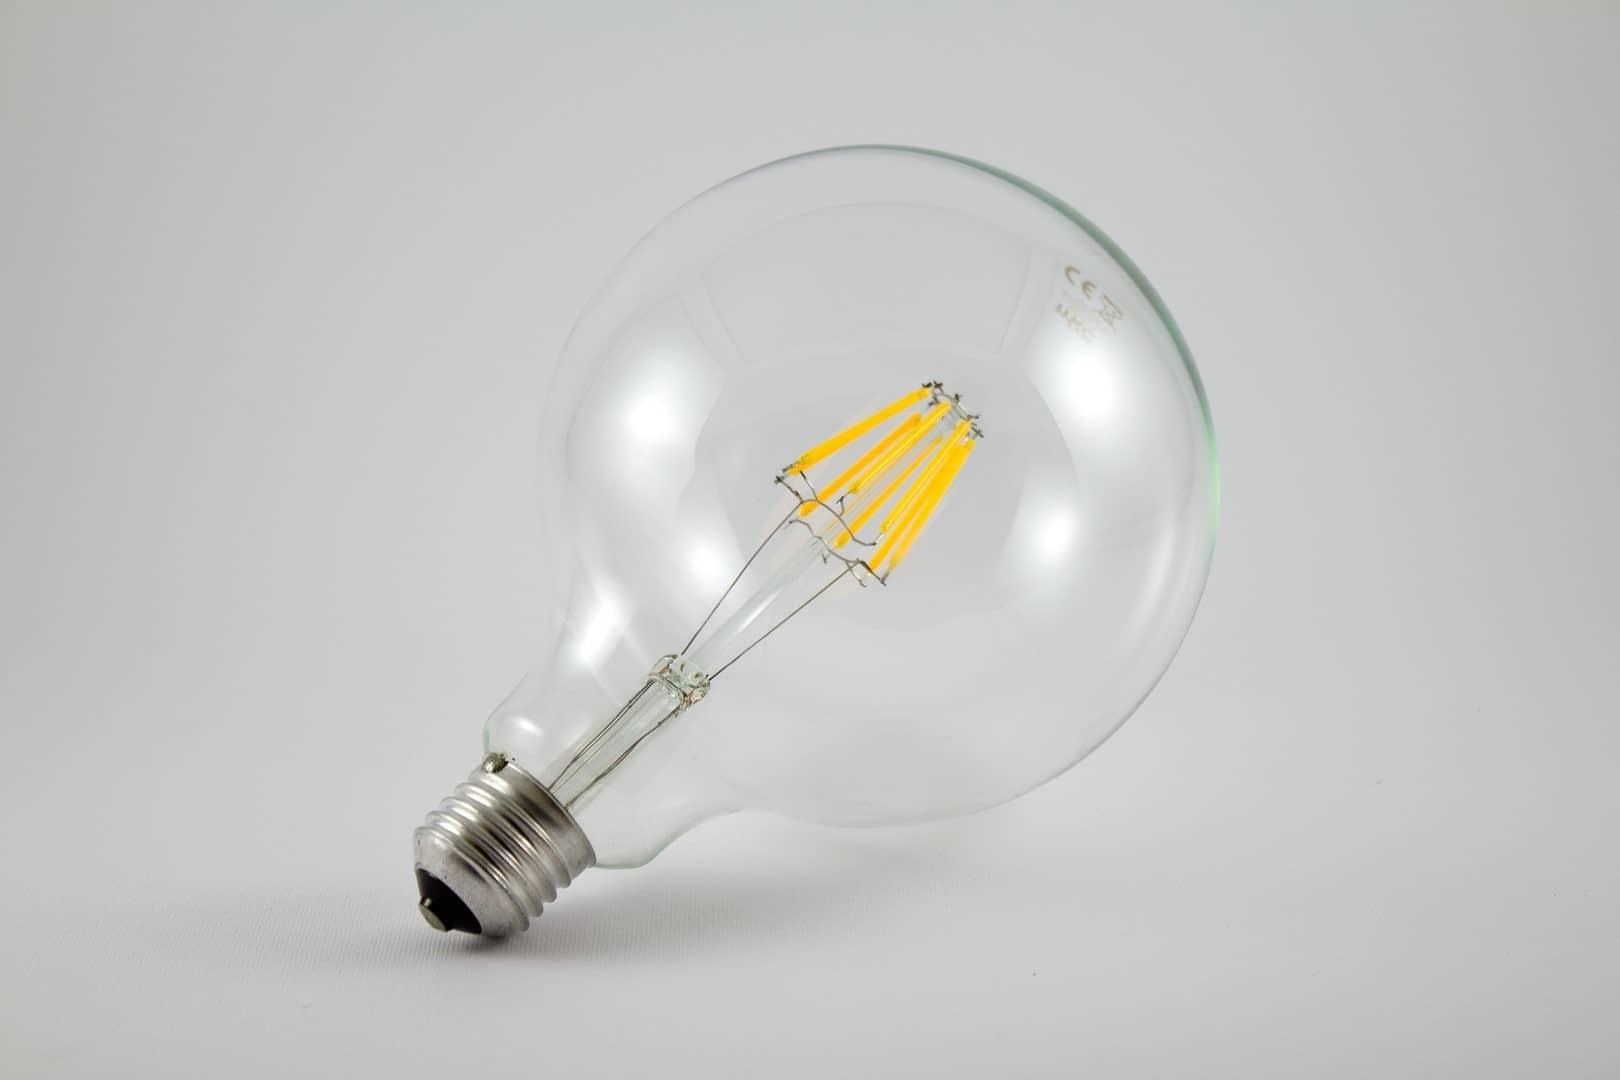 Bombillas LED: ¿Cuáles son las mejores de 2020?